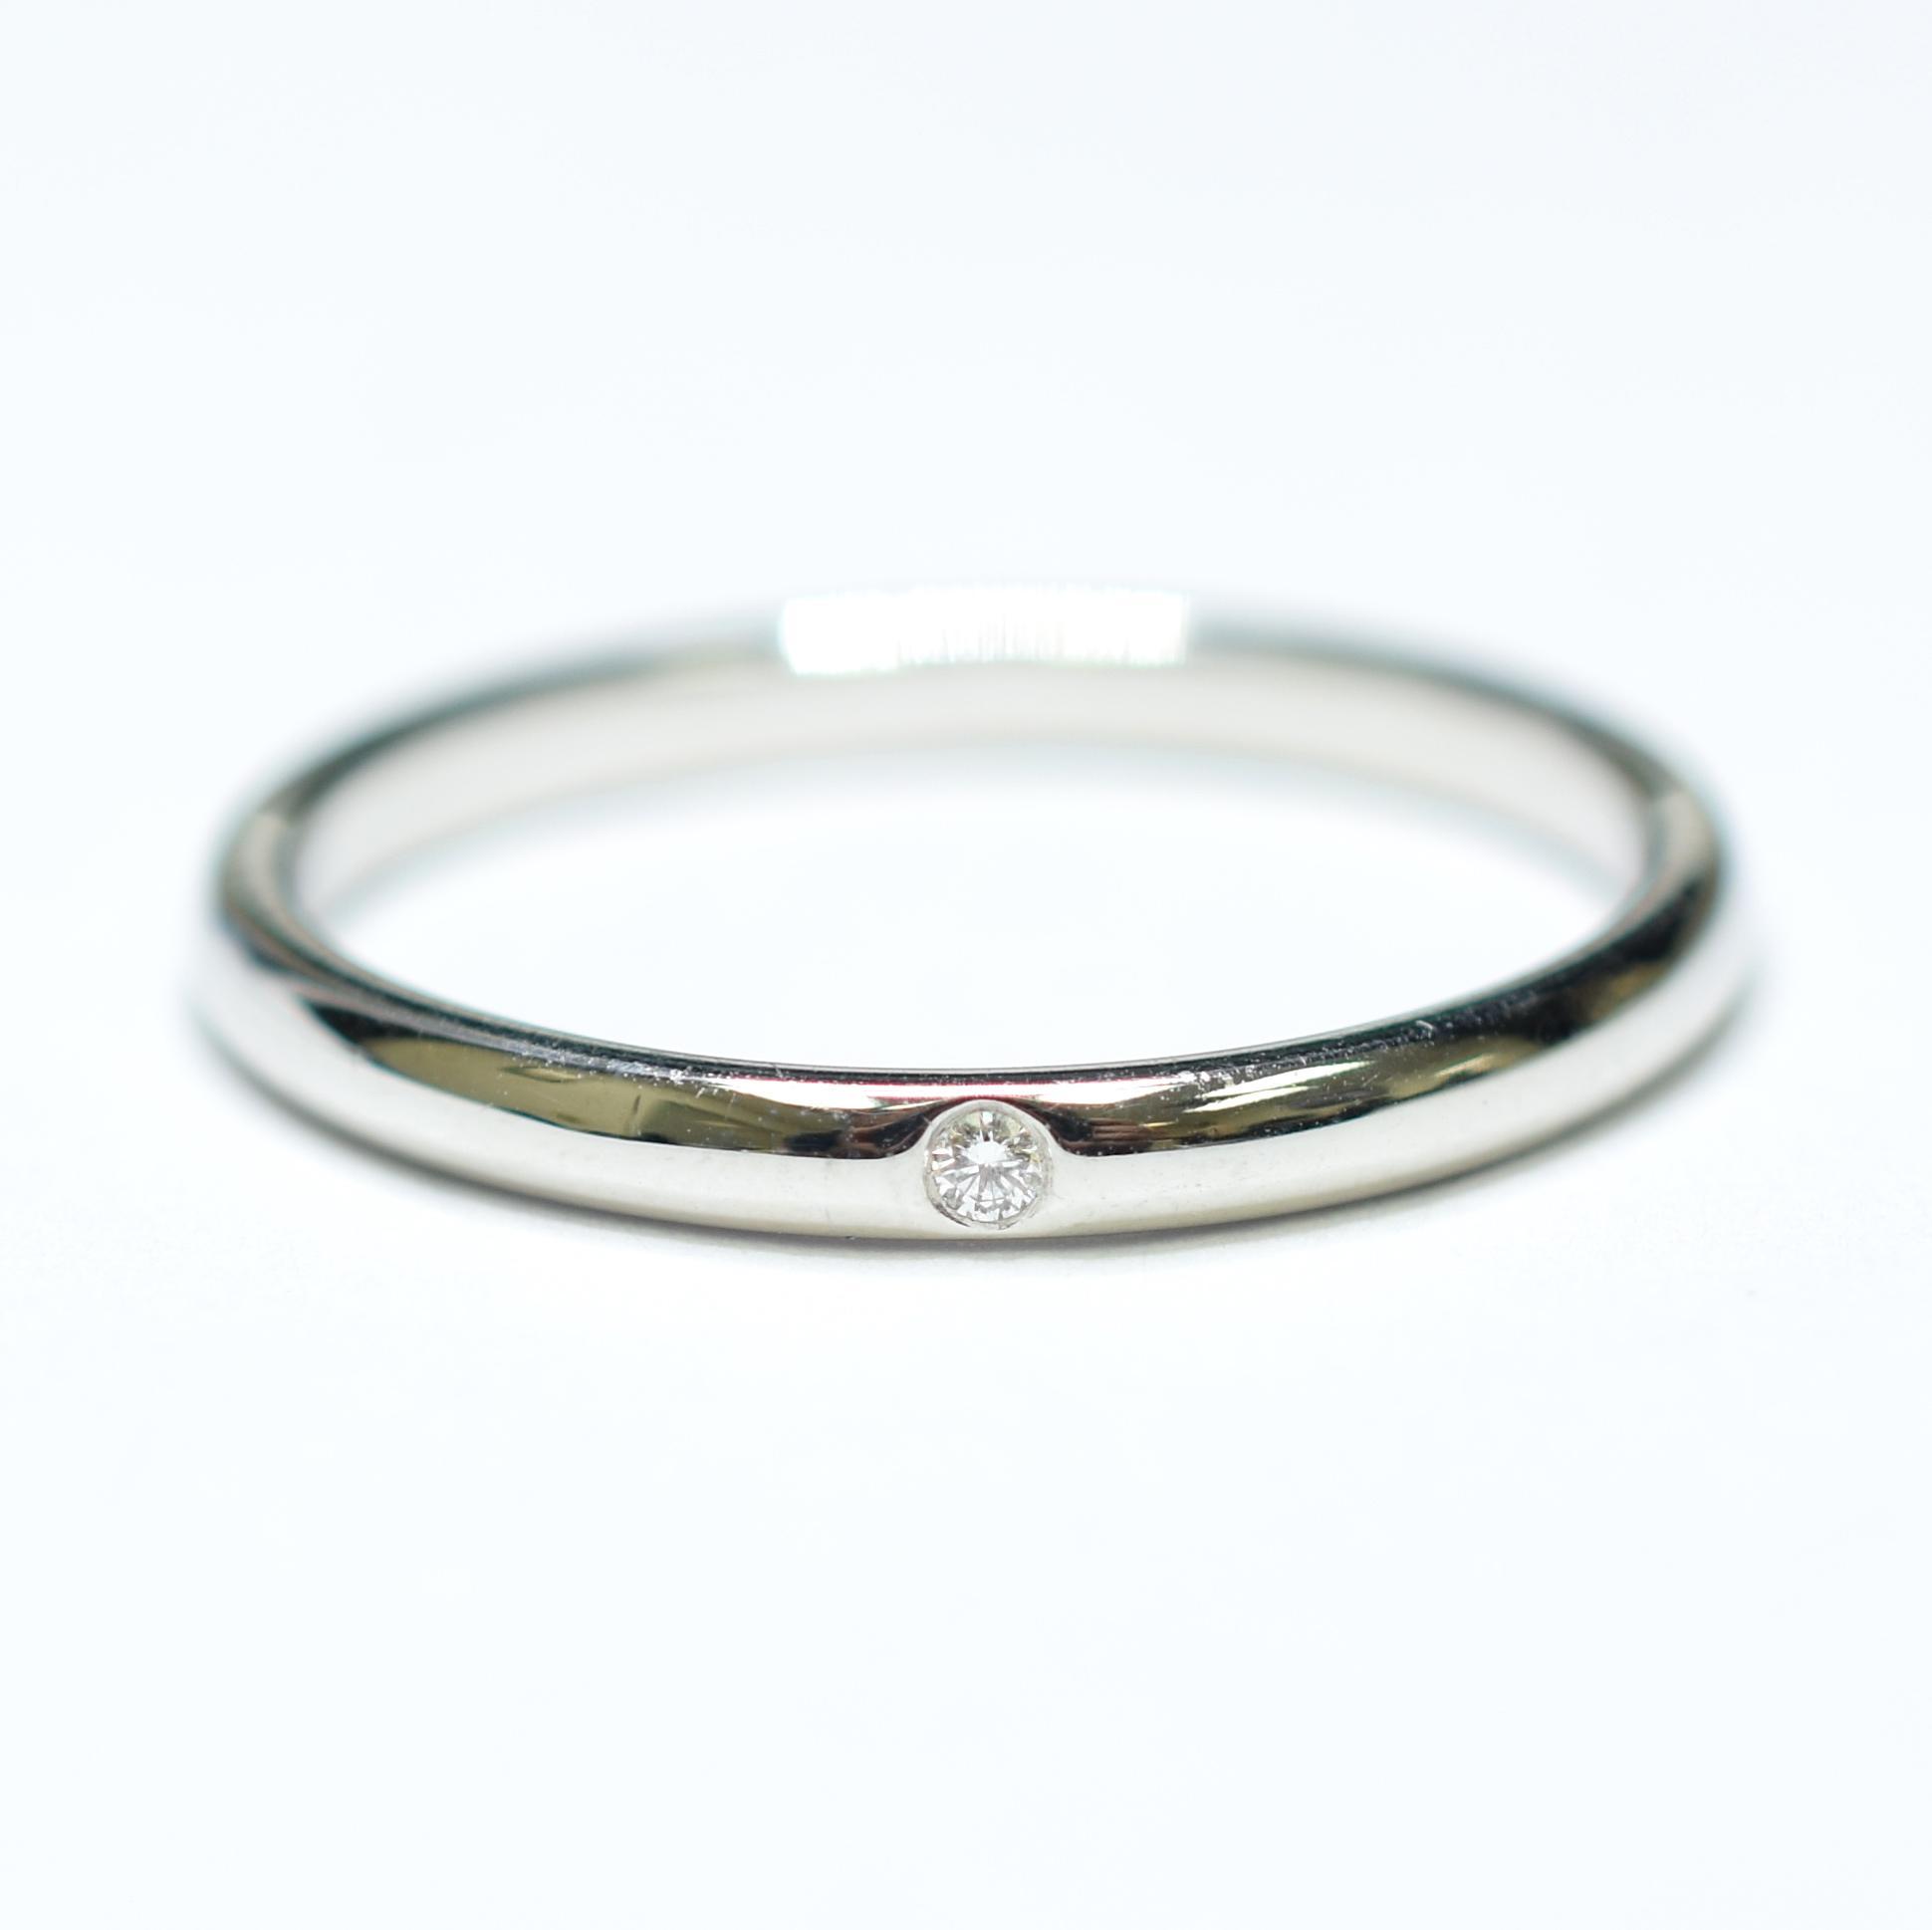 9c0f327a3 Image 1 of 2. Tiffany & Co. Elsa Peretti Design Platinum Bezel Set Round  Diamond Ring